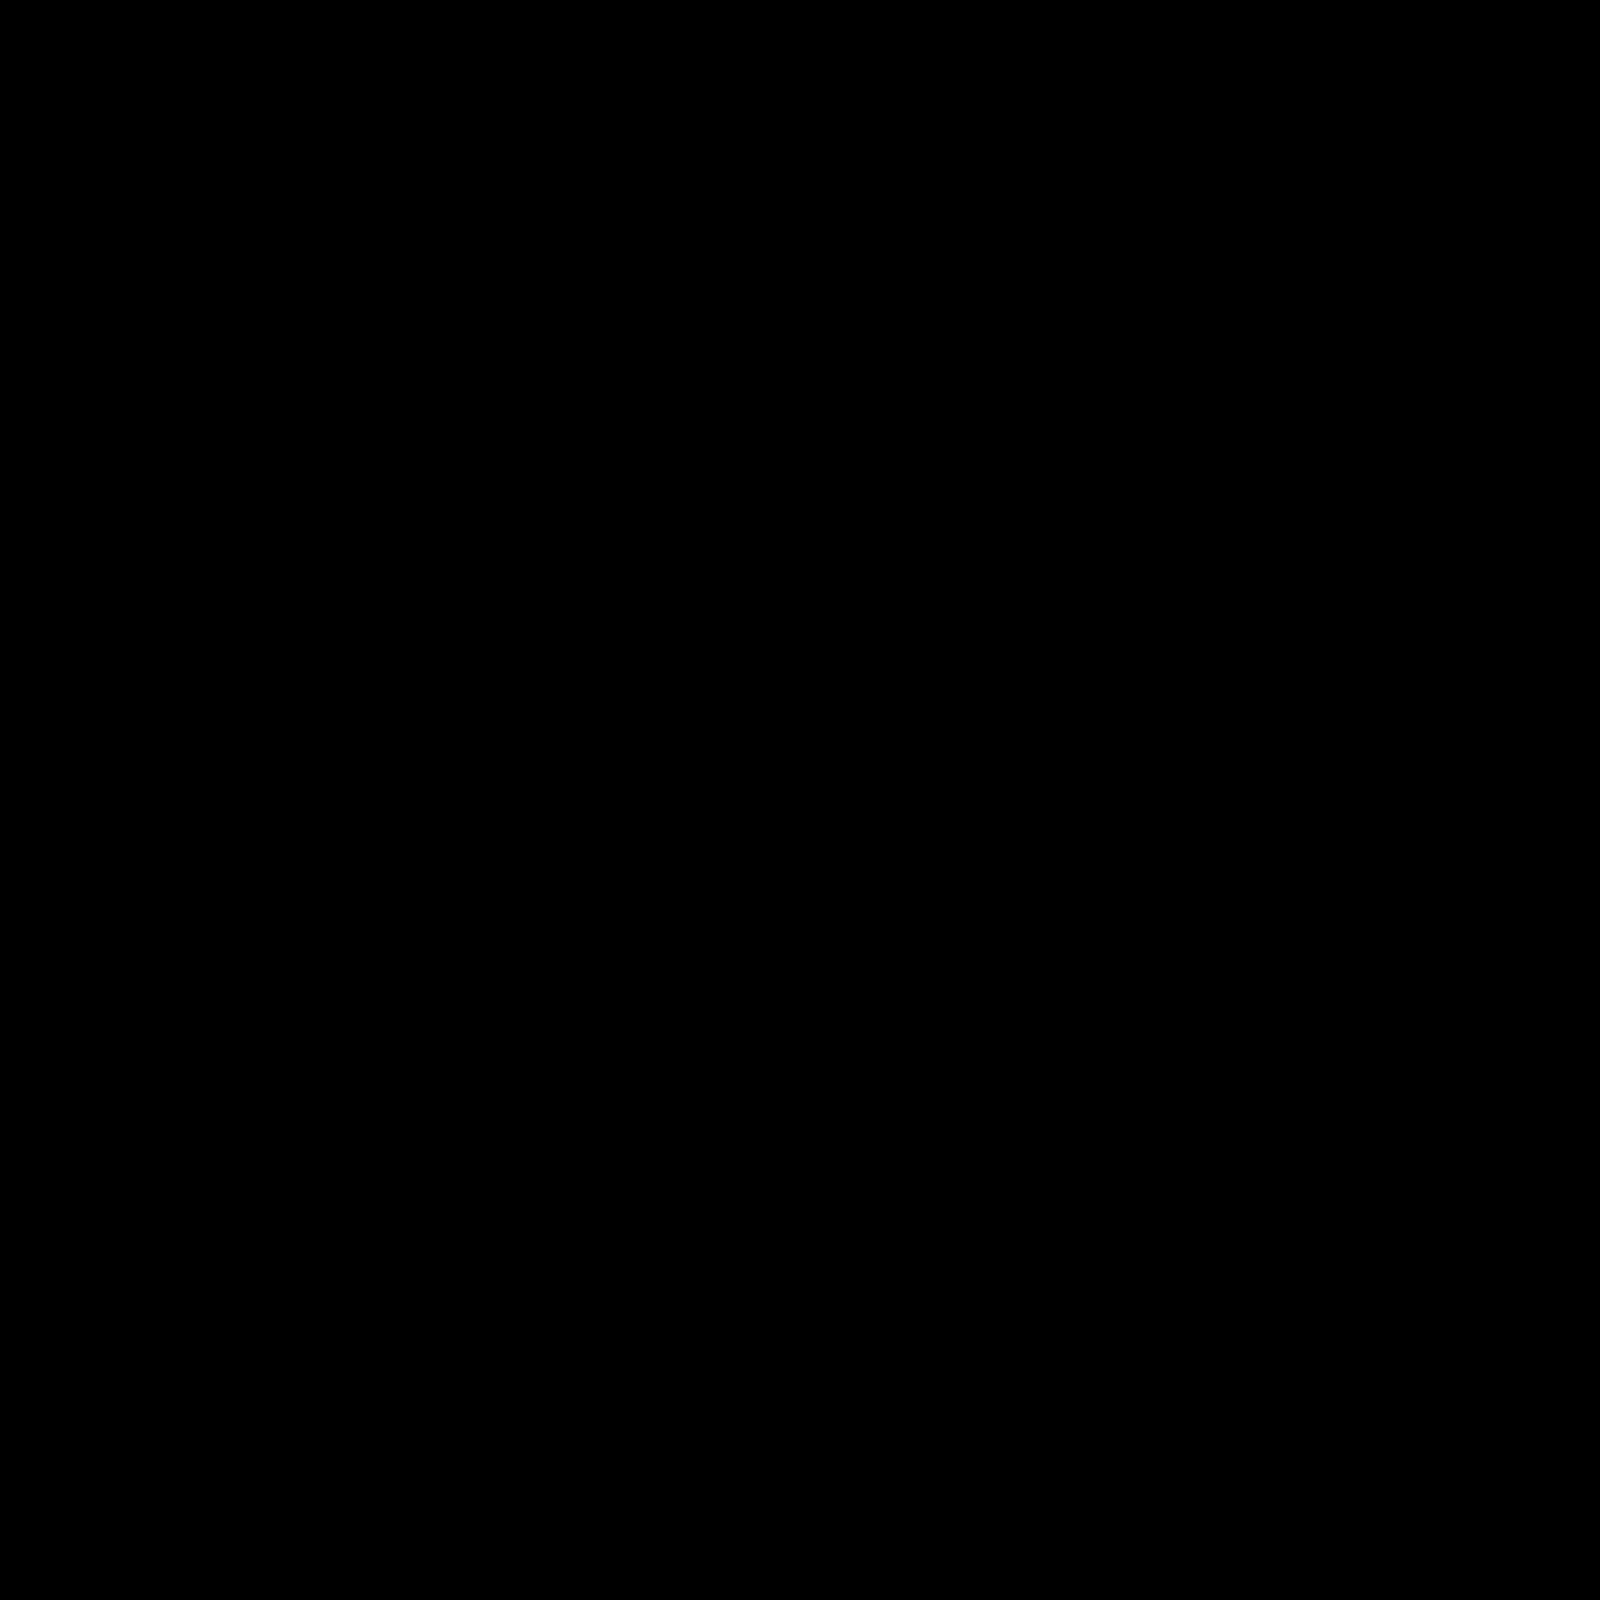 Prepaid Recharge icon